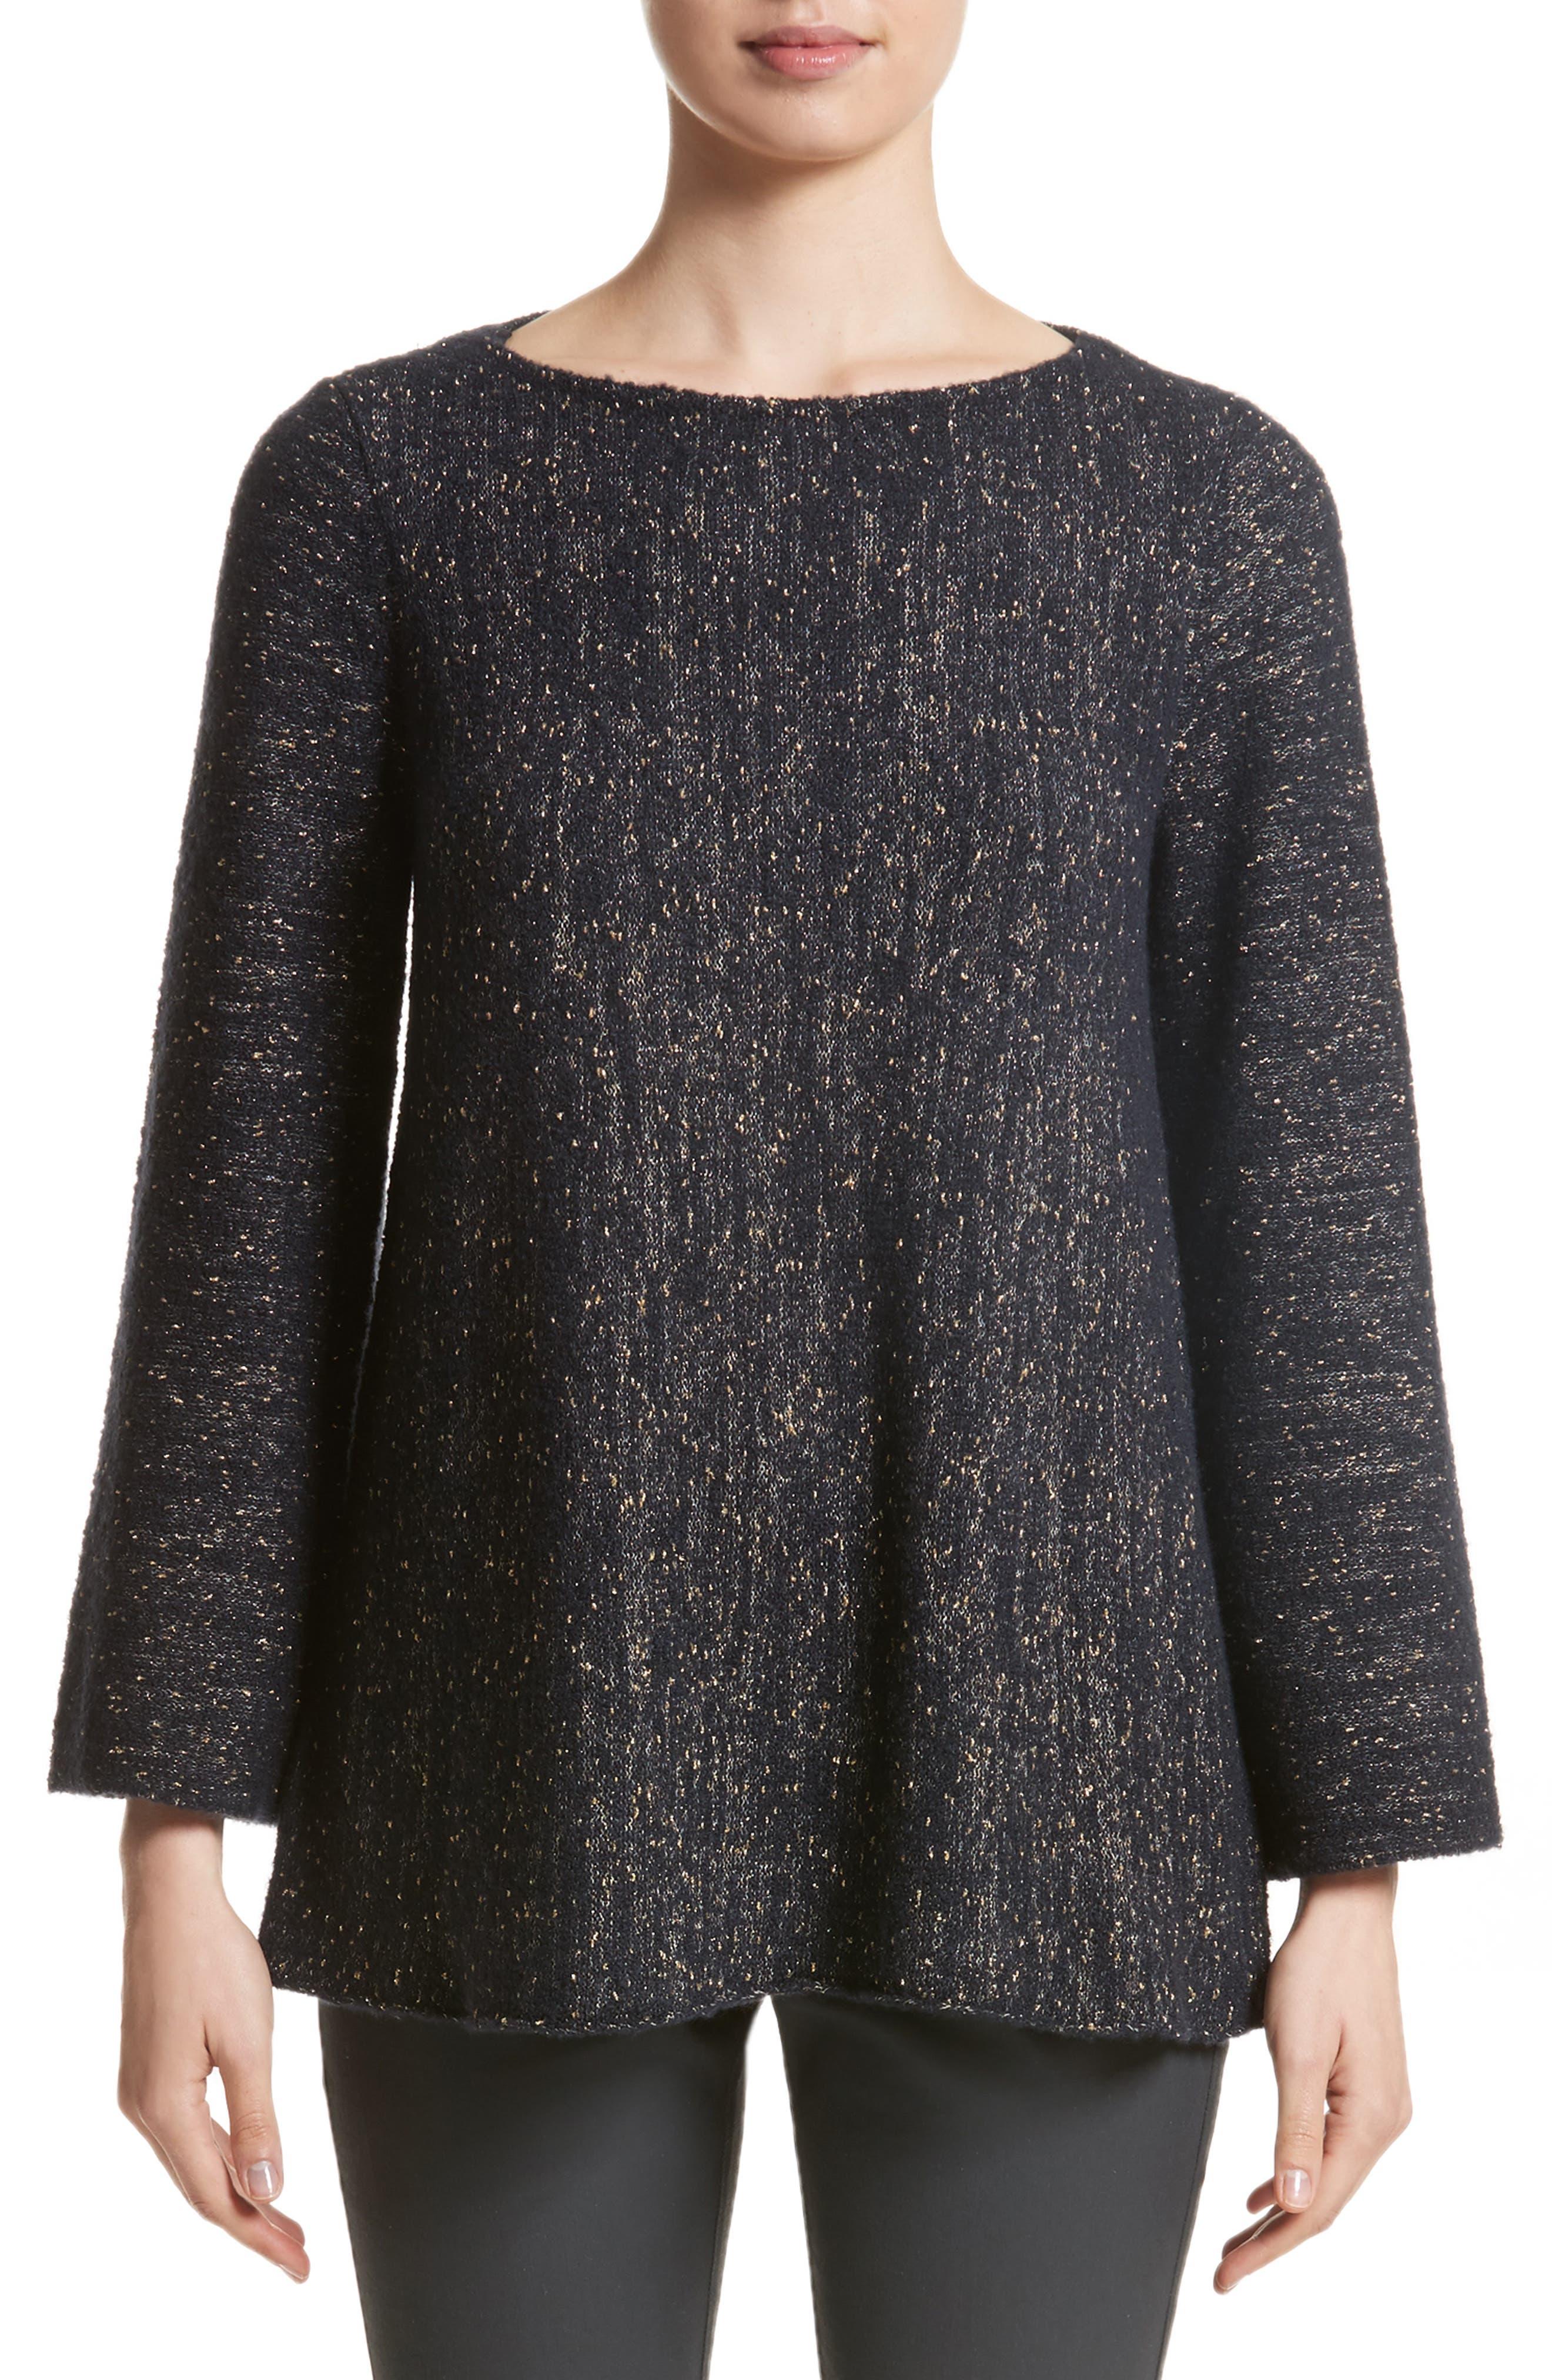 Lafayette Metallic Knit A-Line Sweater,                         Main,                         color, Ink Metallic